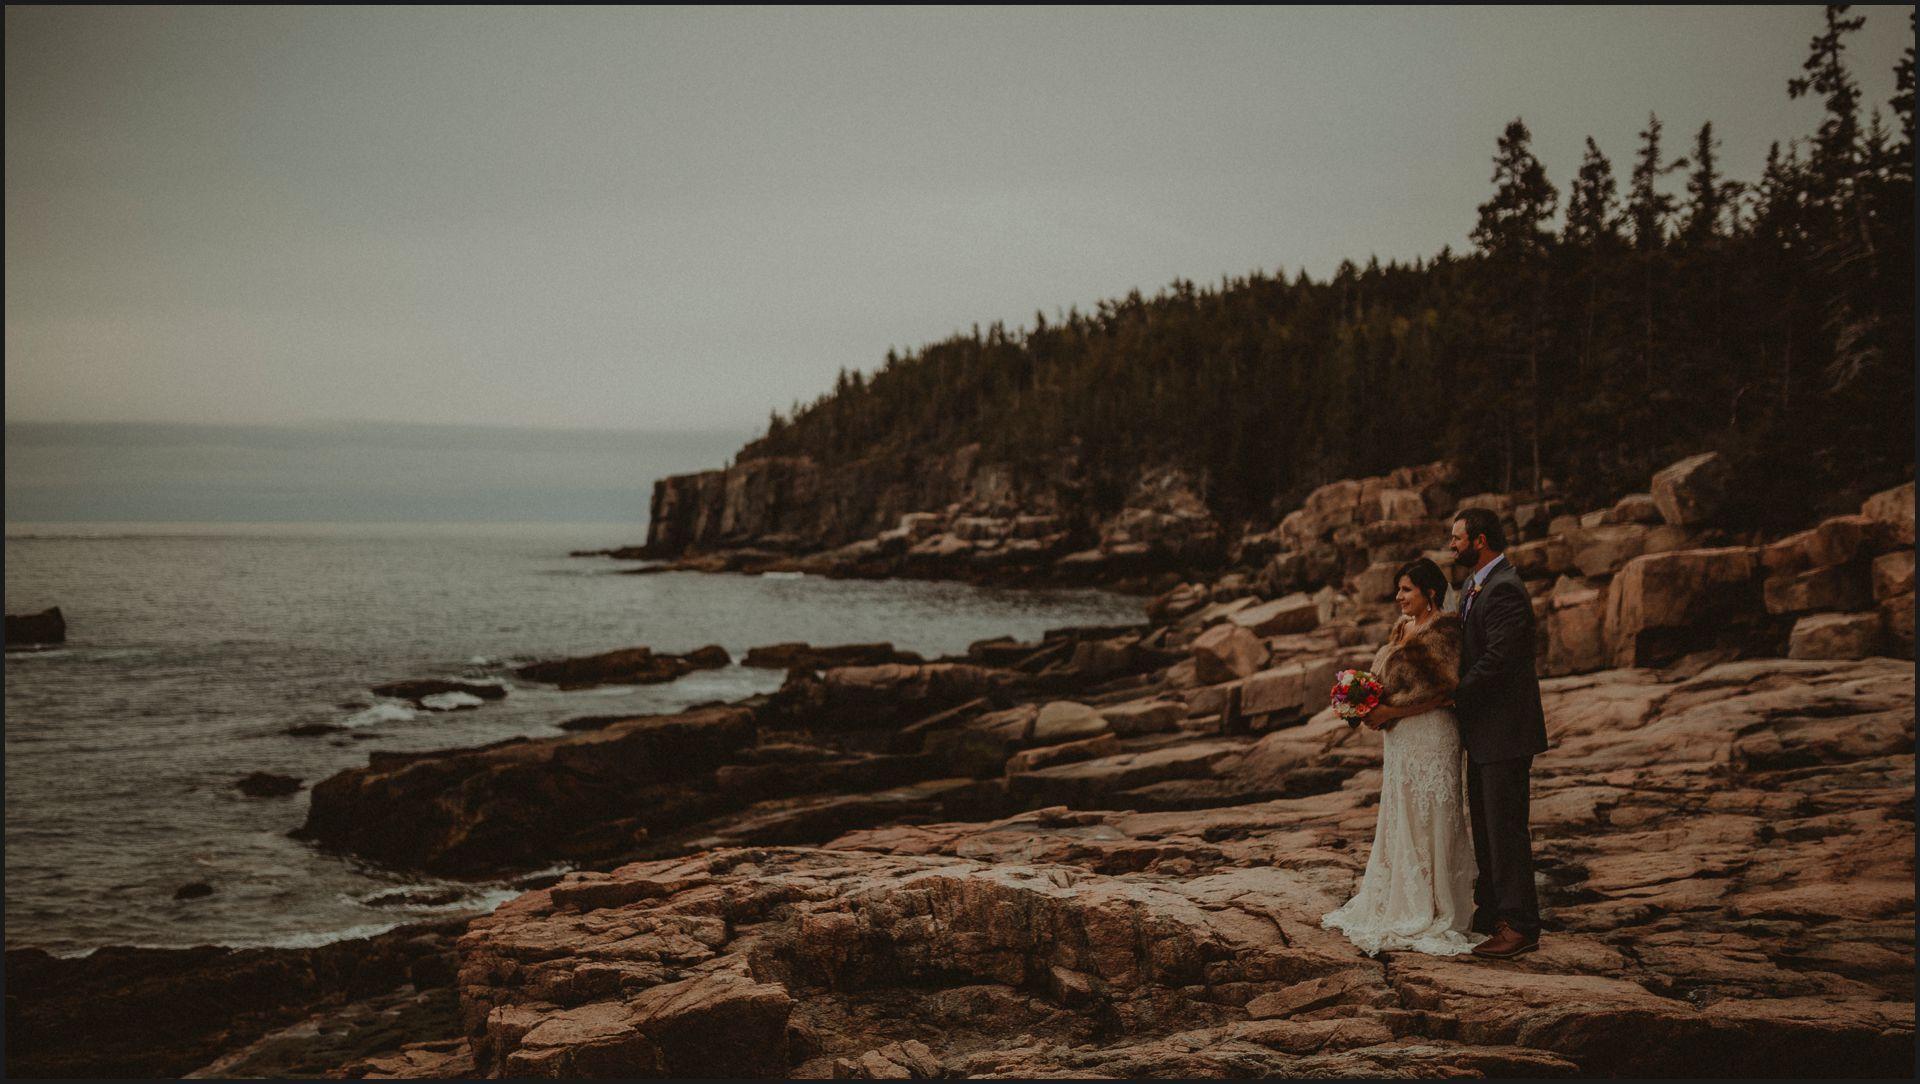 acadia national park, maine, wedding, couple portrait, bride, groom